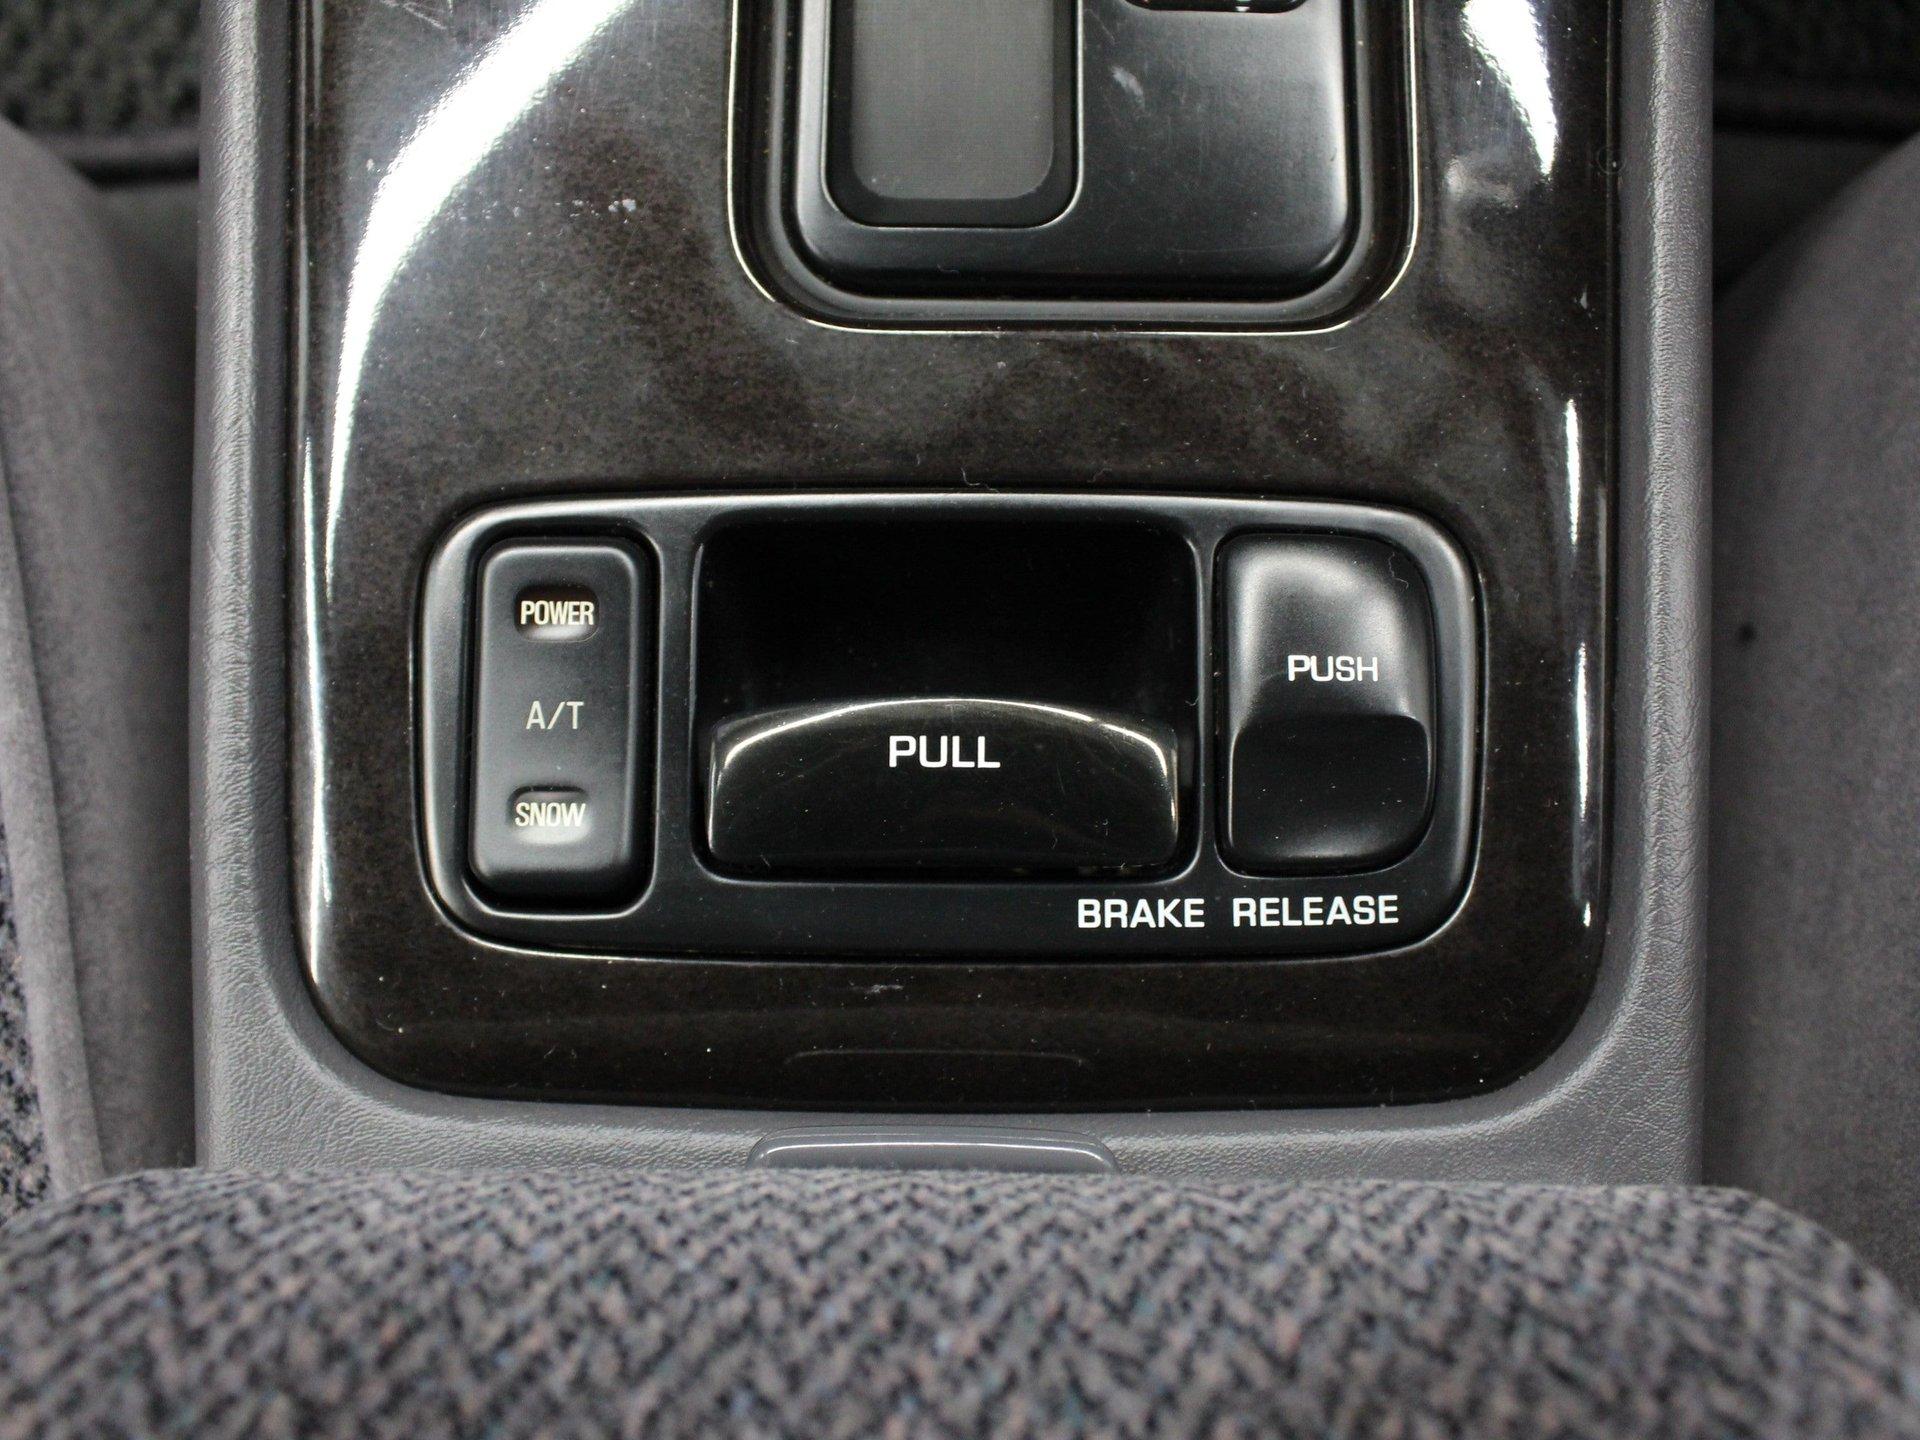 1993 Nissan Gloria